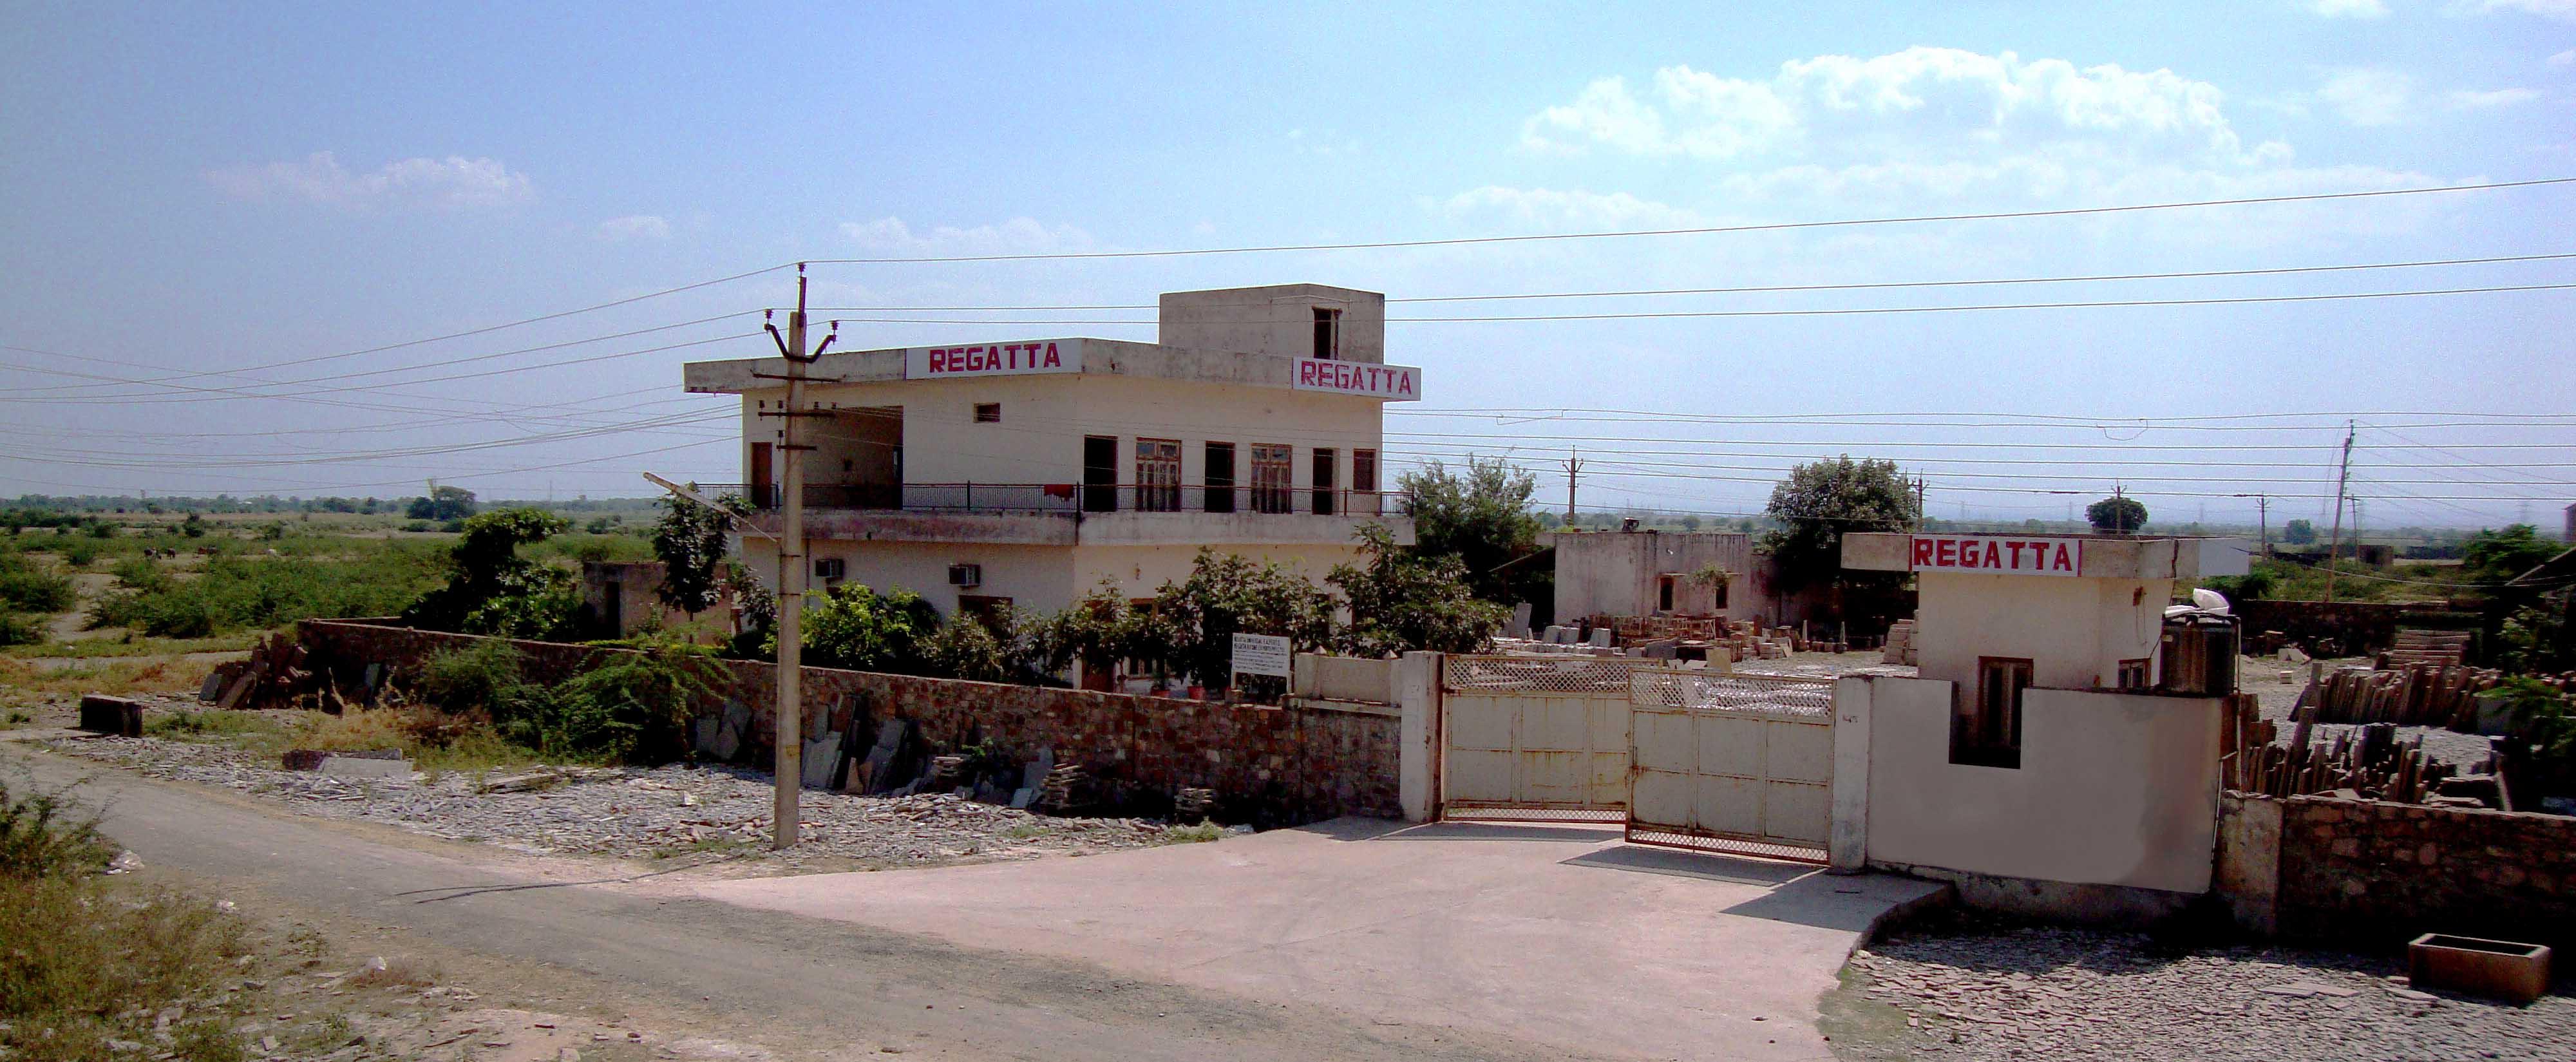 Regattas factory